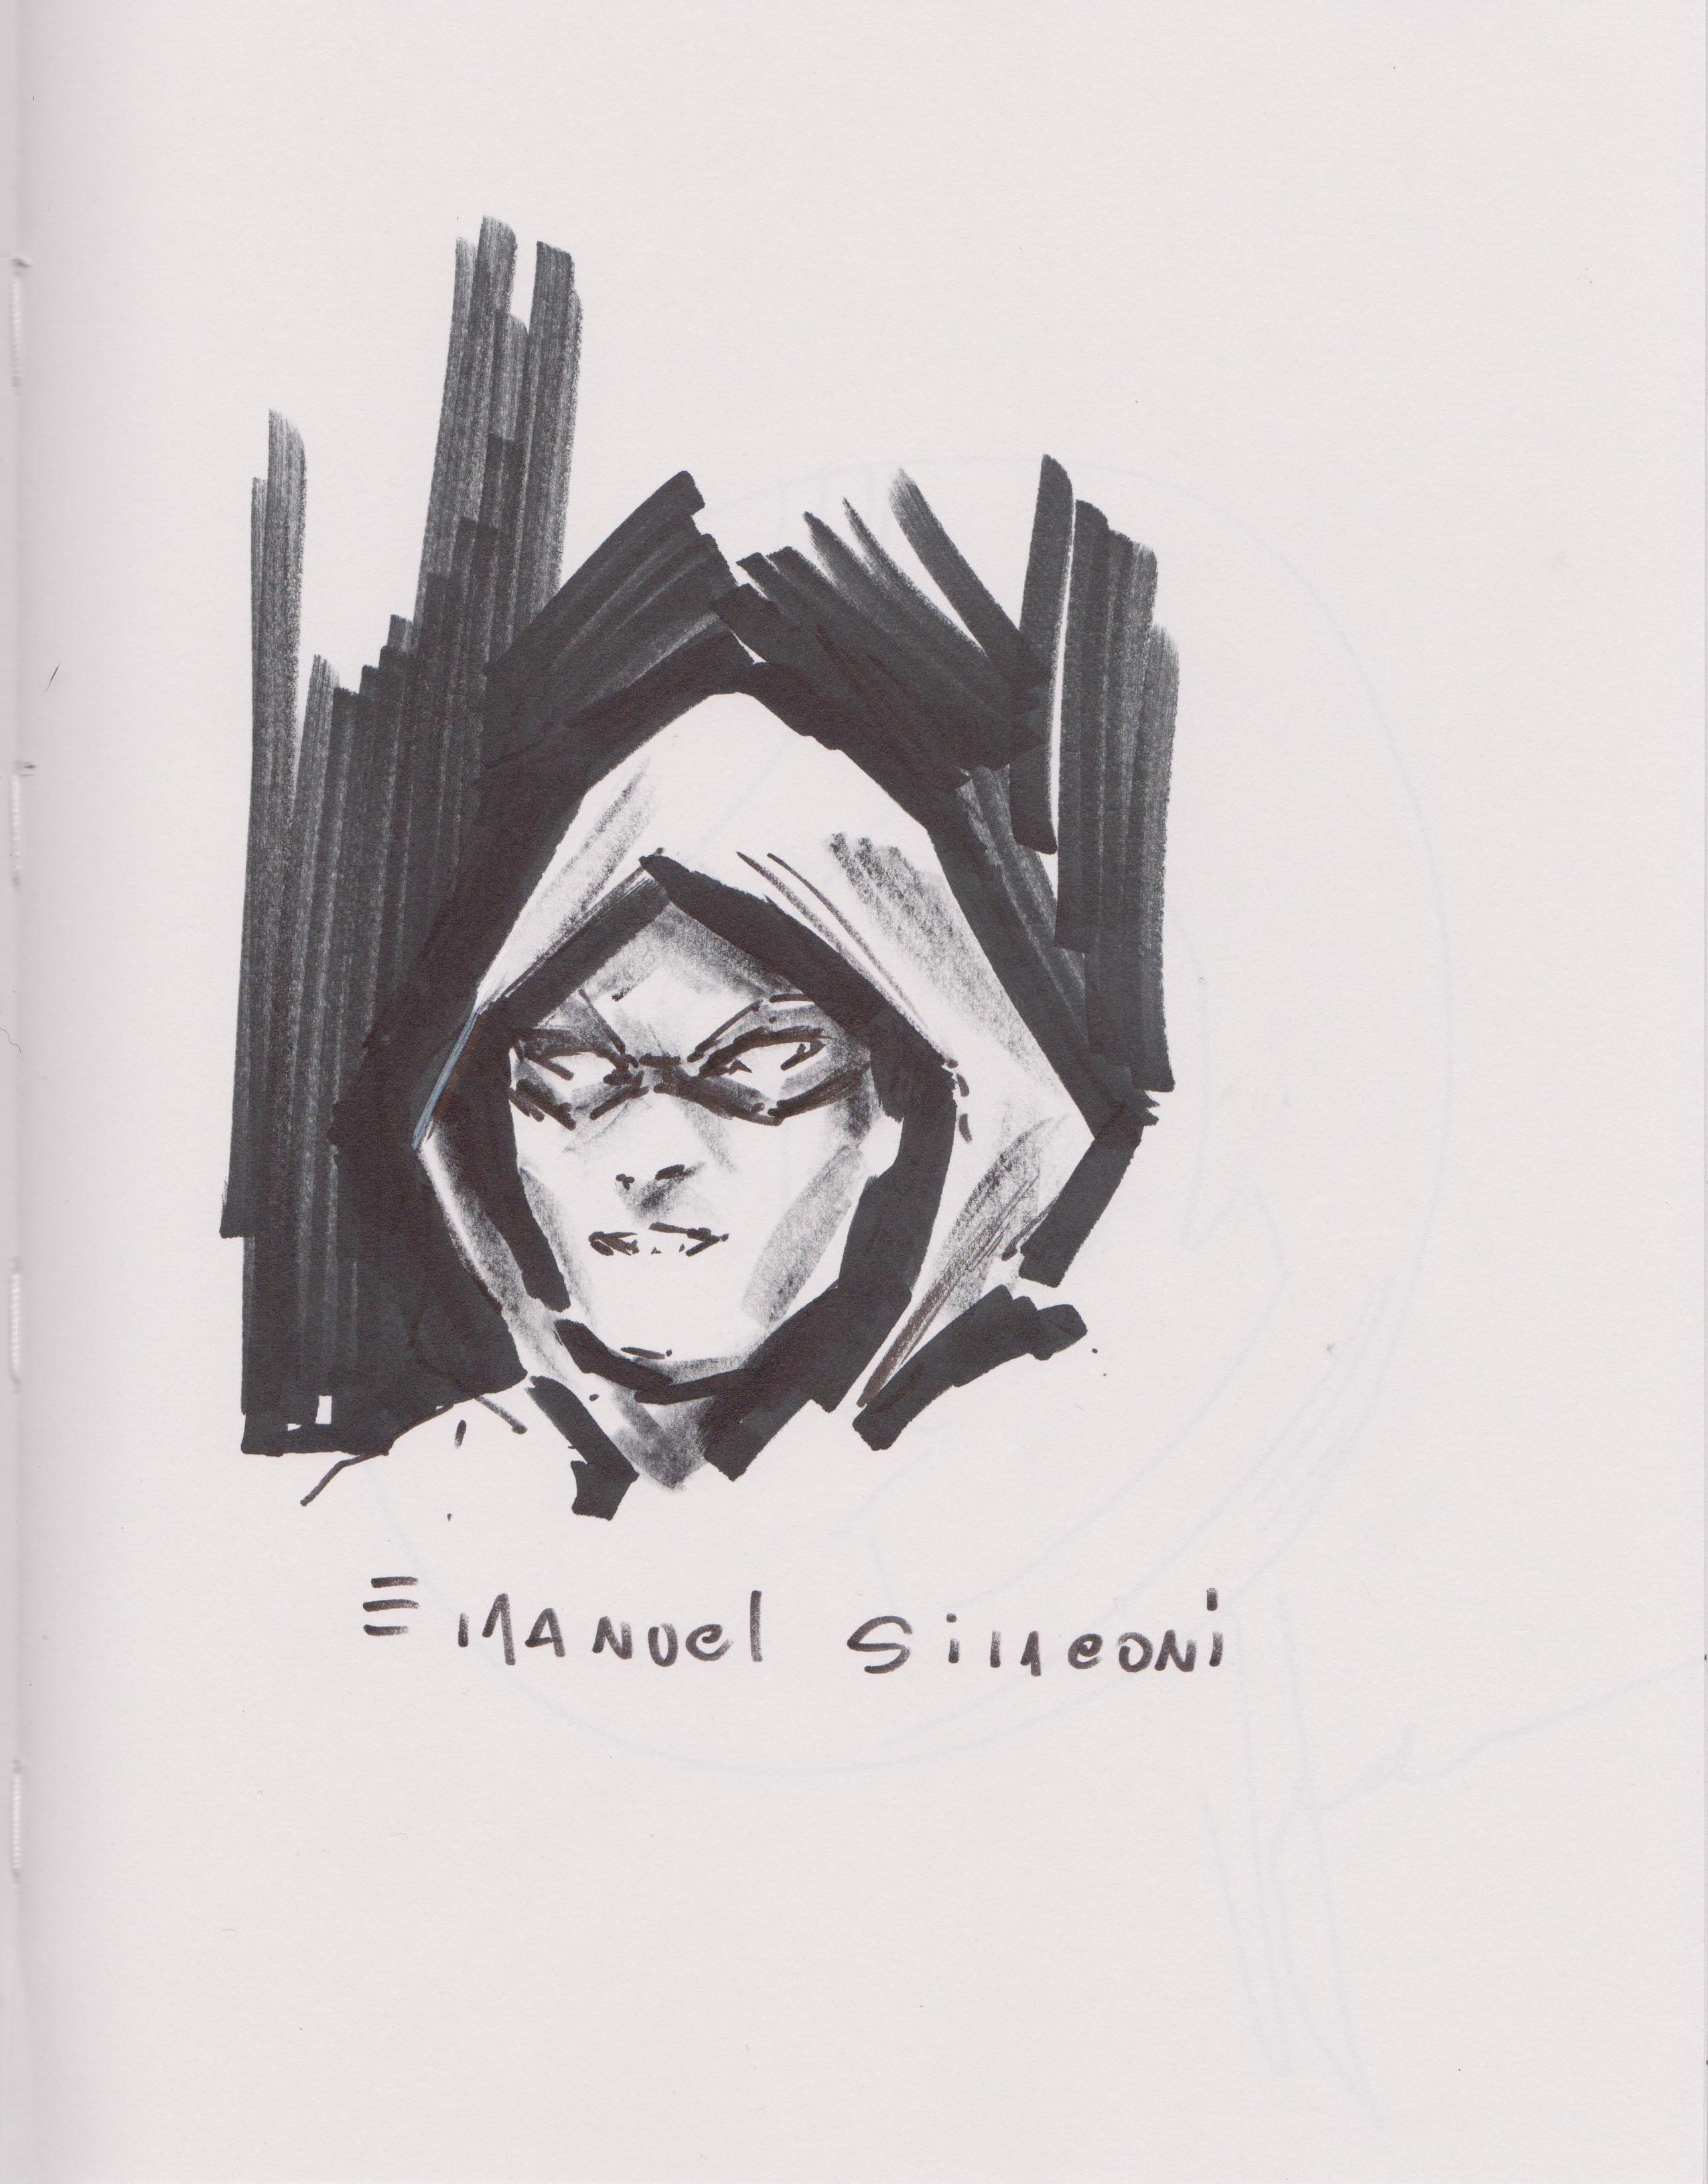 Green Arrow by Emanuel Simeoni